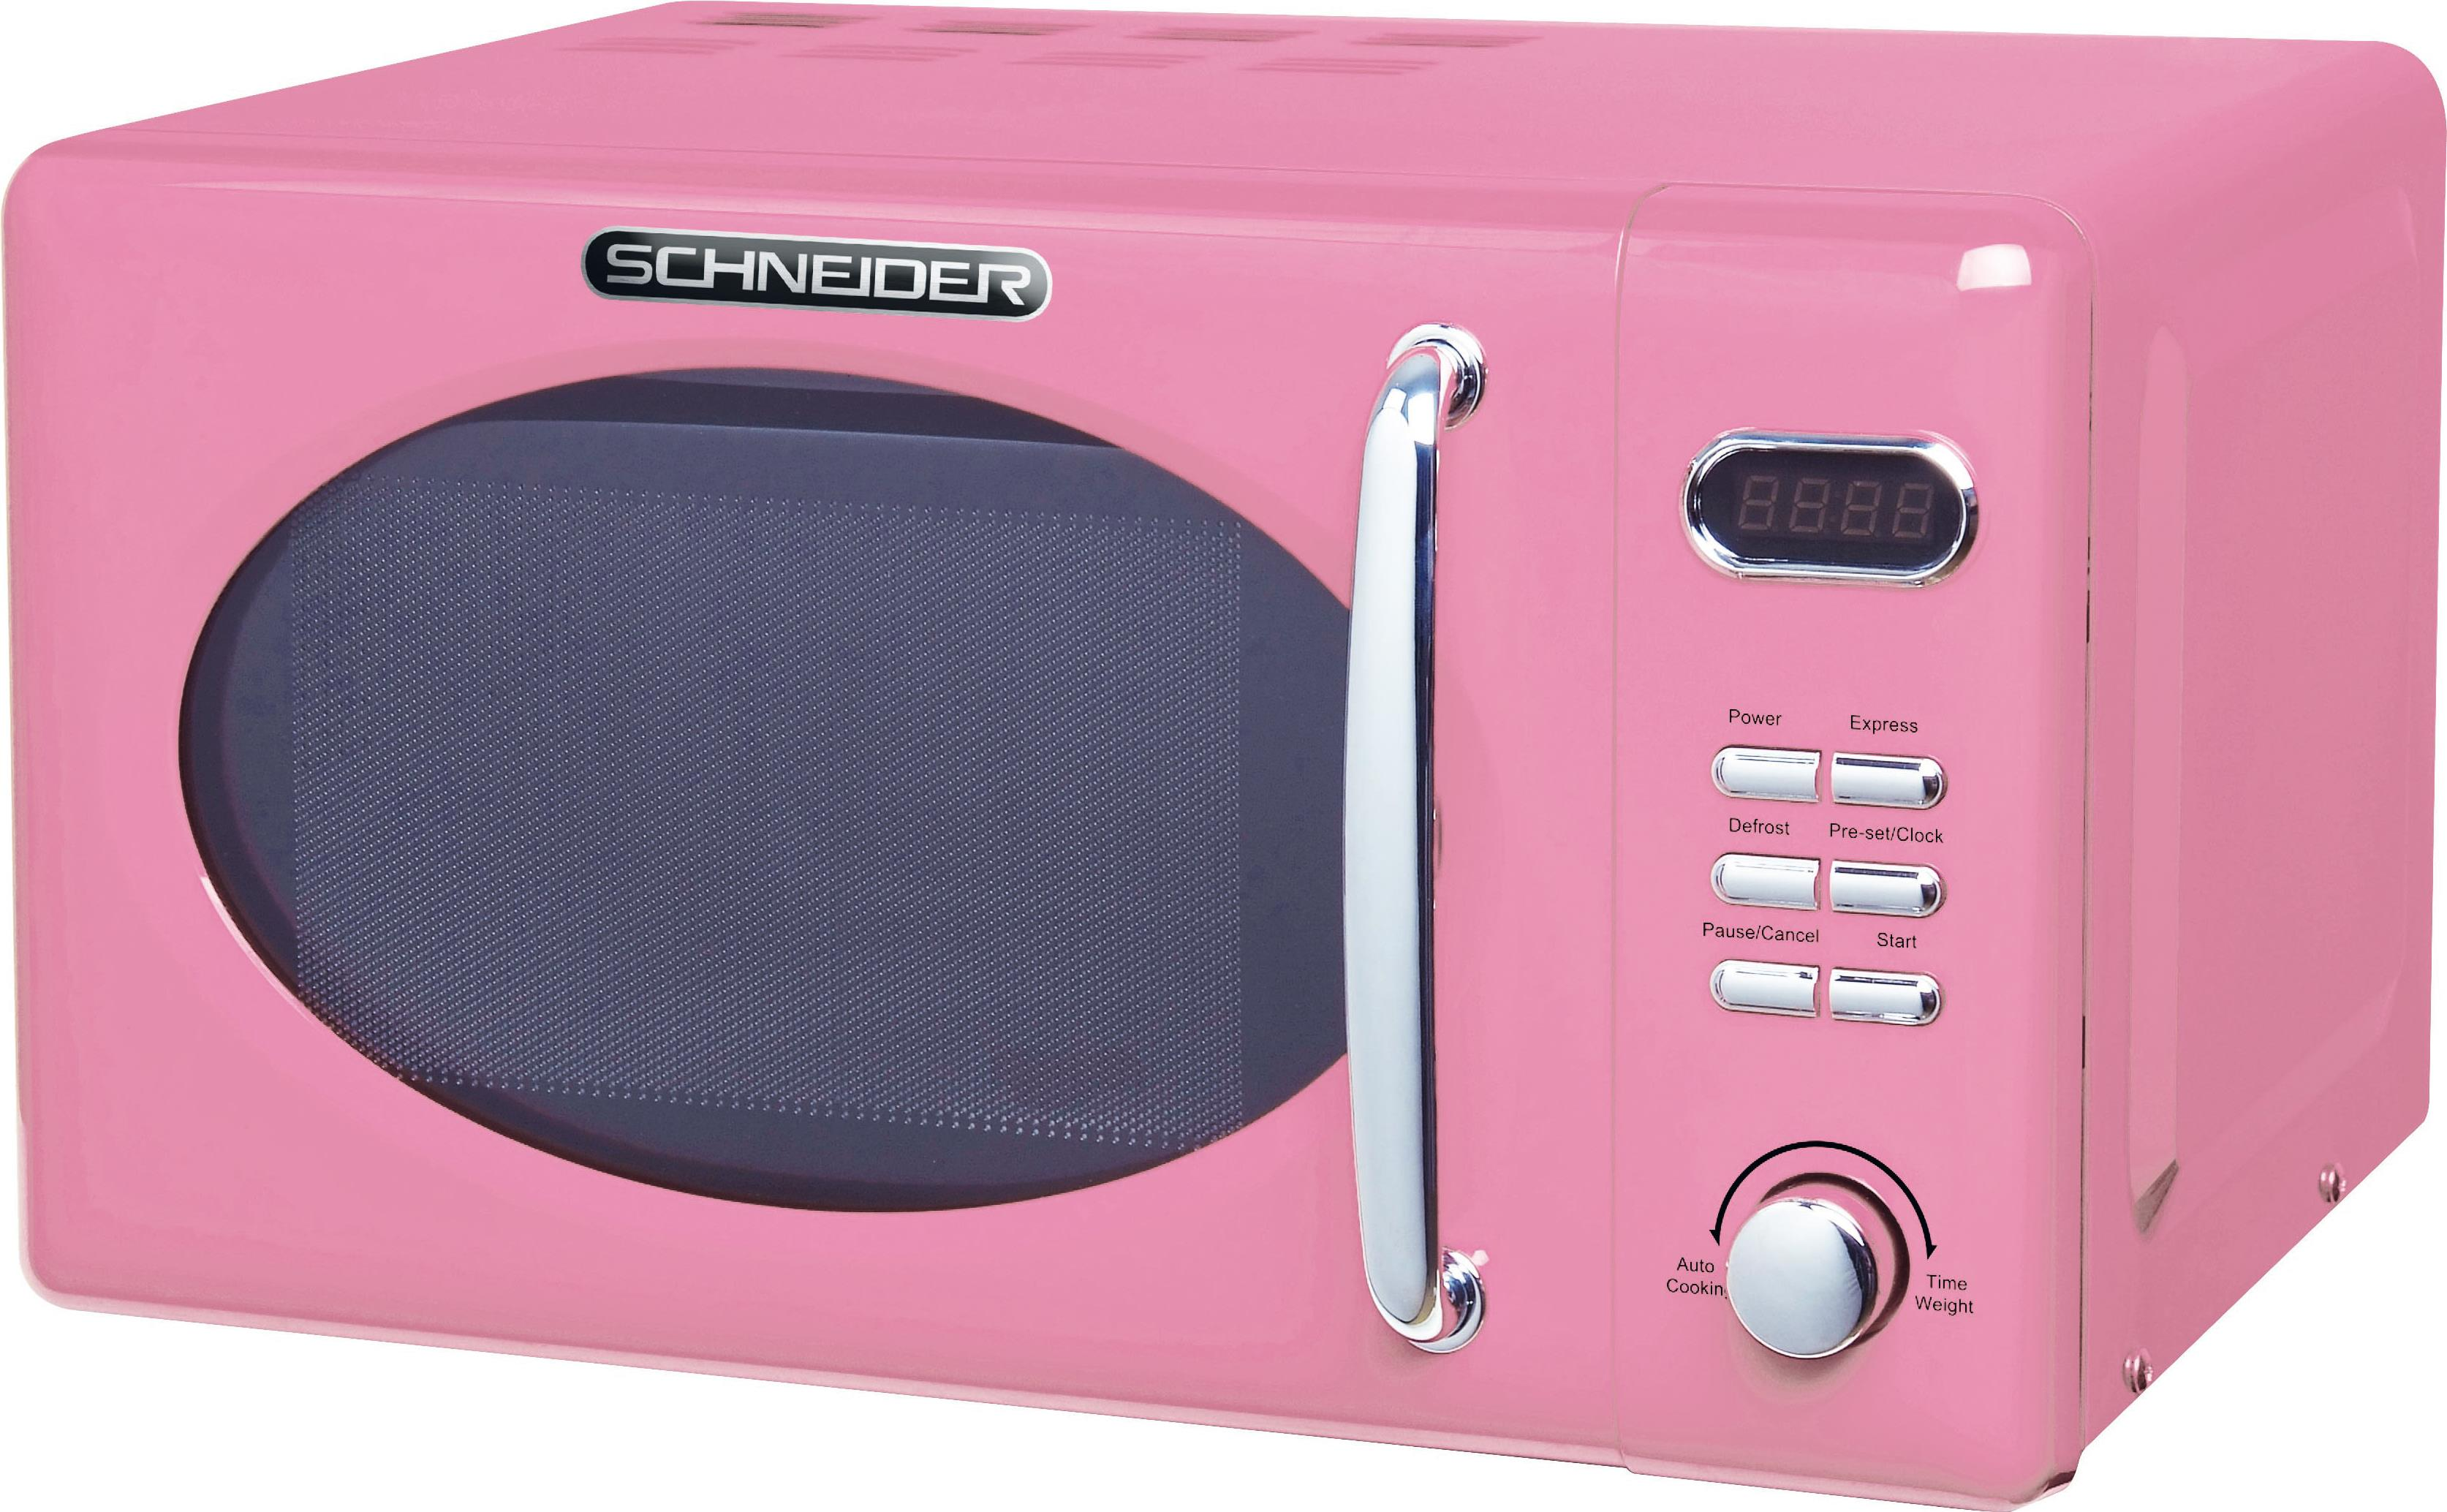 Schneider MW720 SP Pink Mikrowelle Solo (13073)